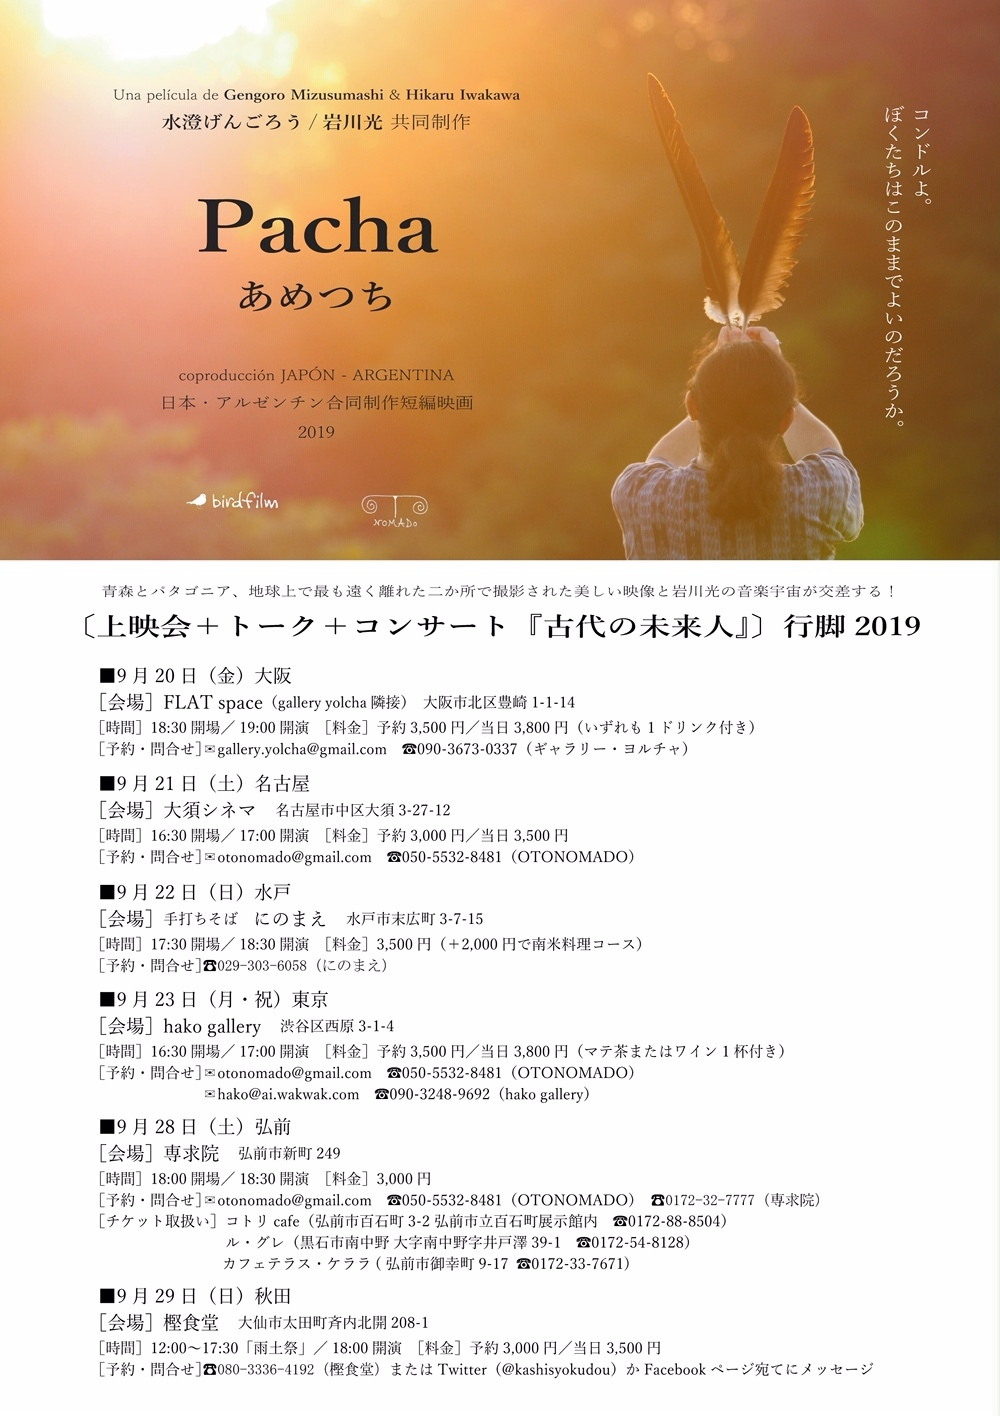 pacha-tour-flyer-2019.jpg